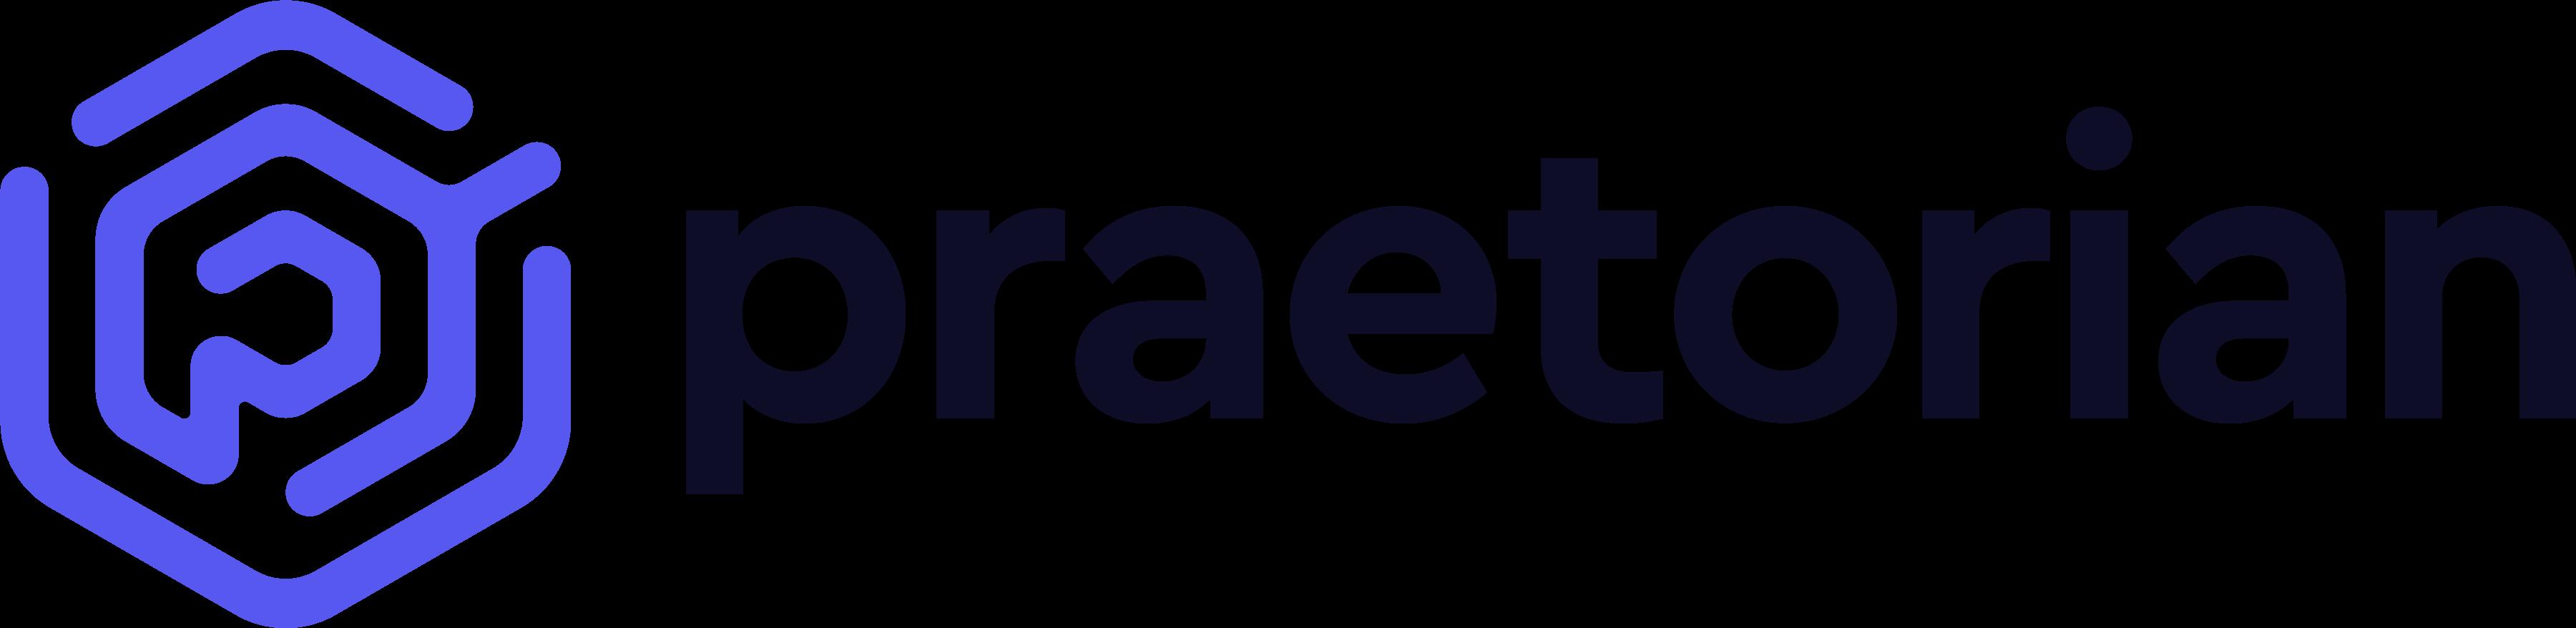 Praetorian-Logo-FullColor-Dark.png